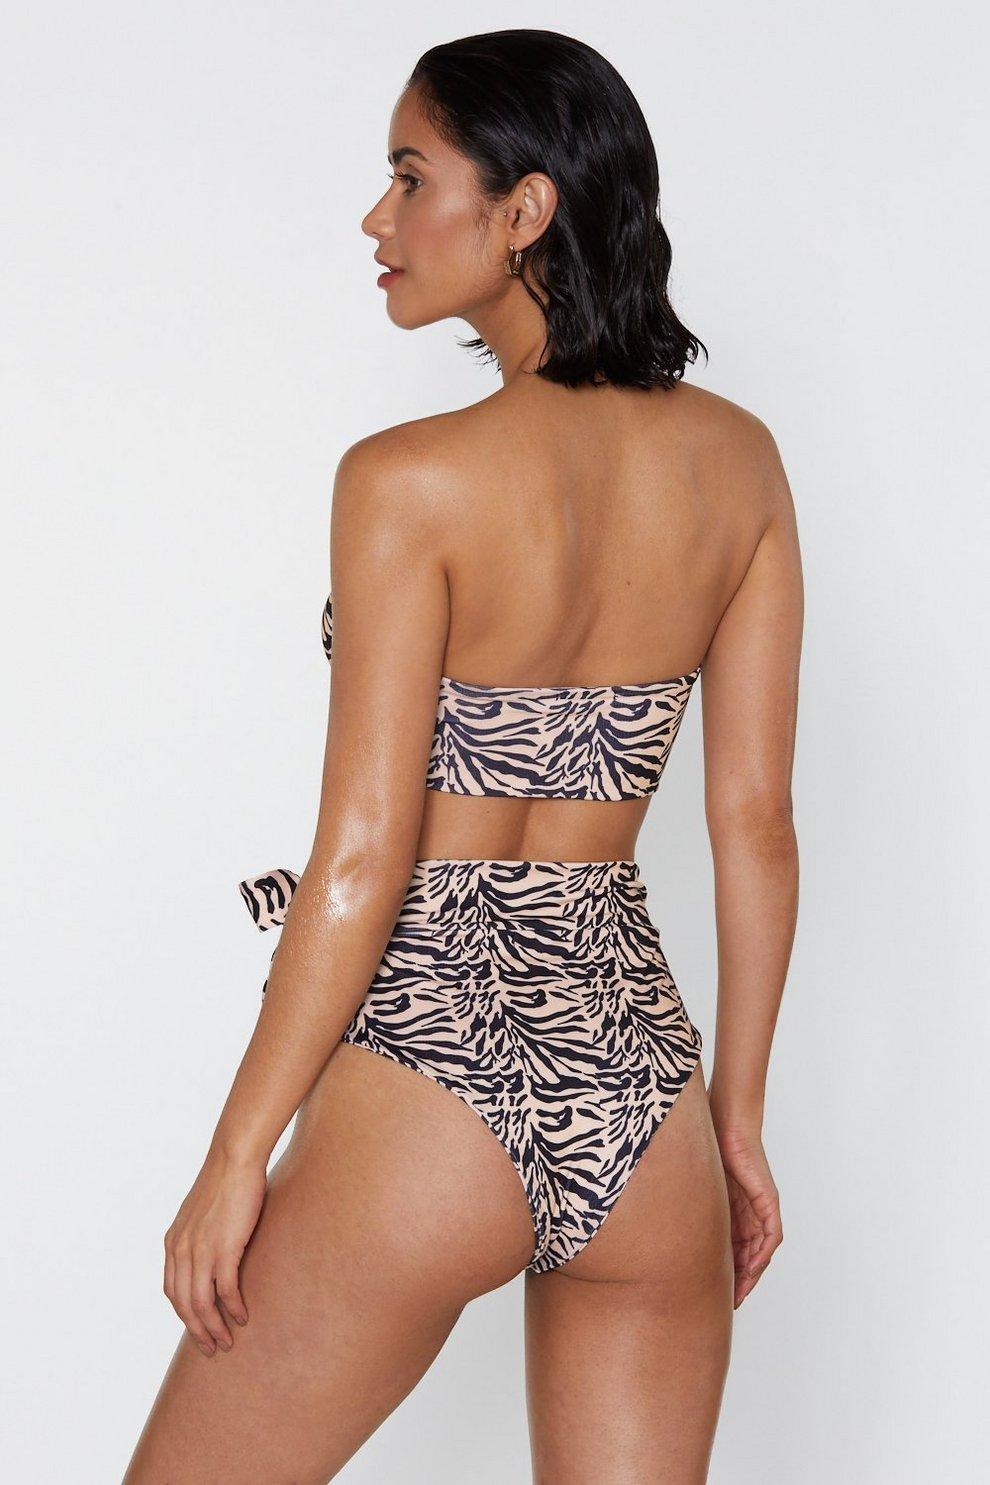 Interesting. Free gal bikini pic you were